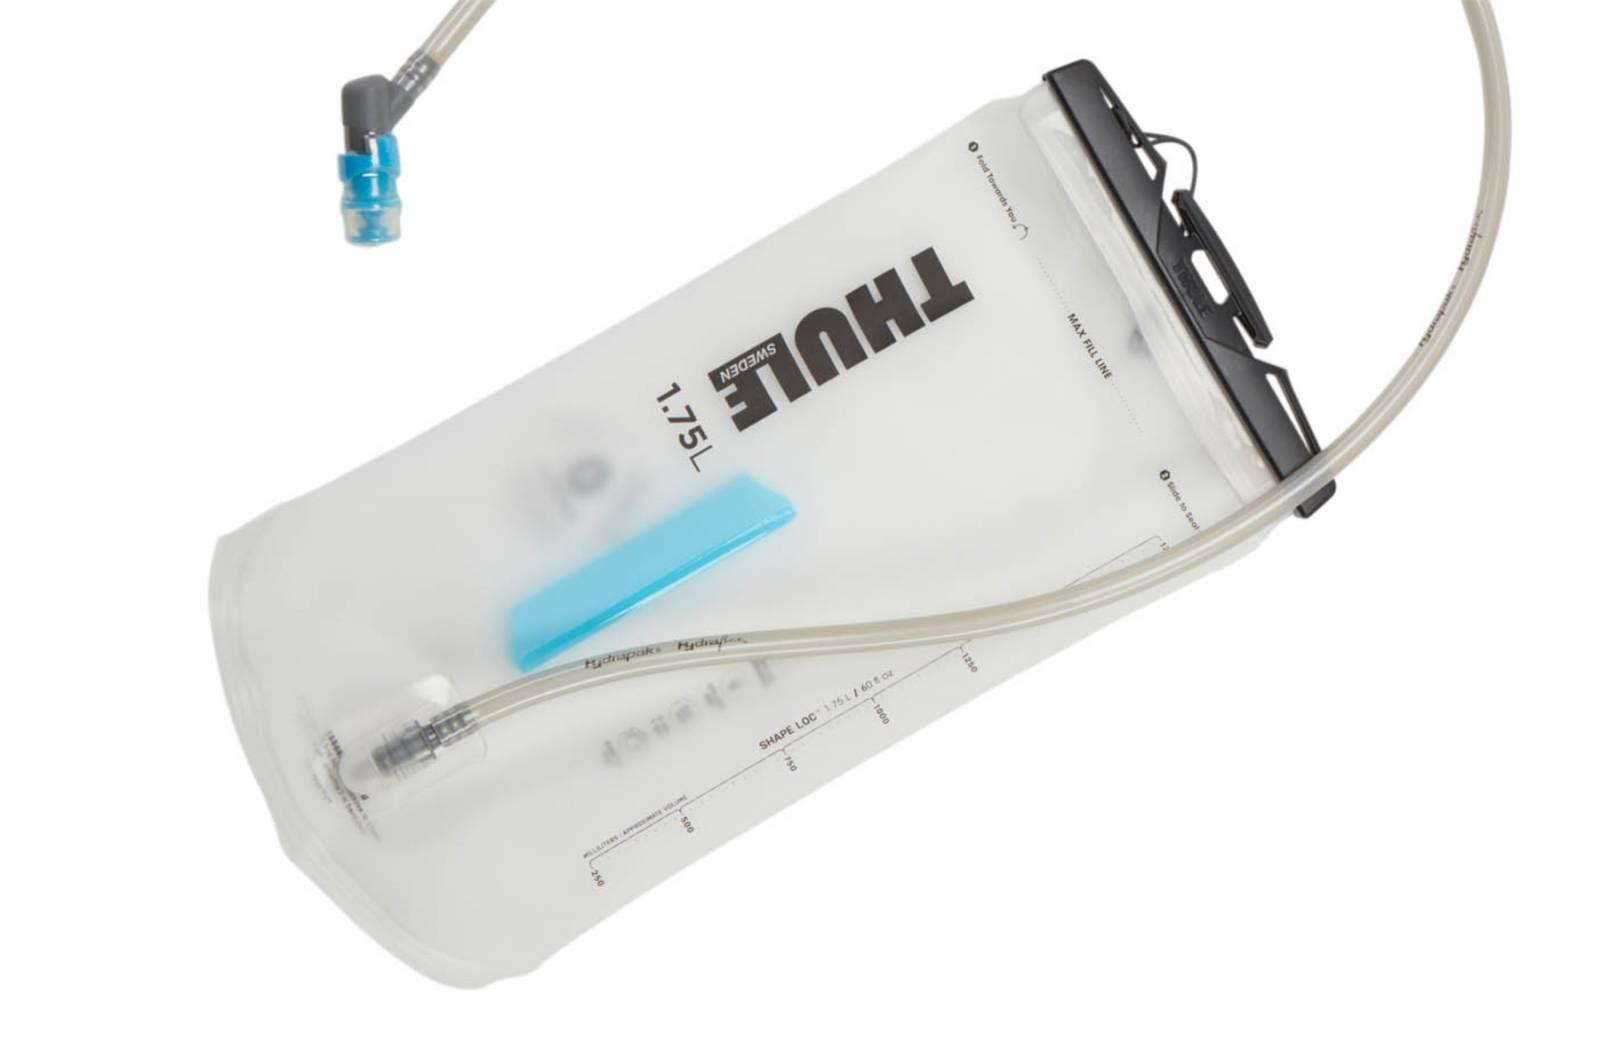 Mochila de hidratação Thule Vital 3L  - BIKE ALLA CARTE